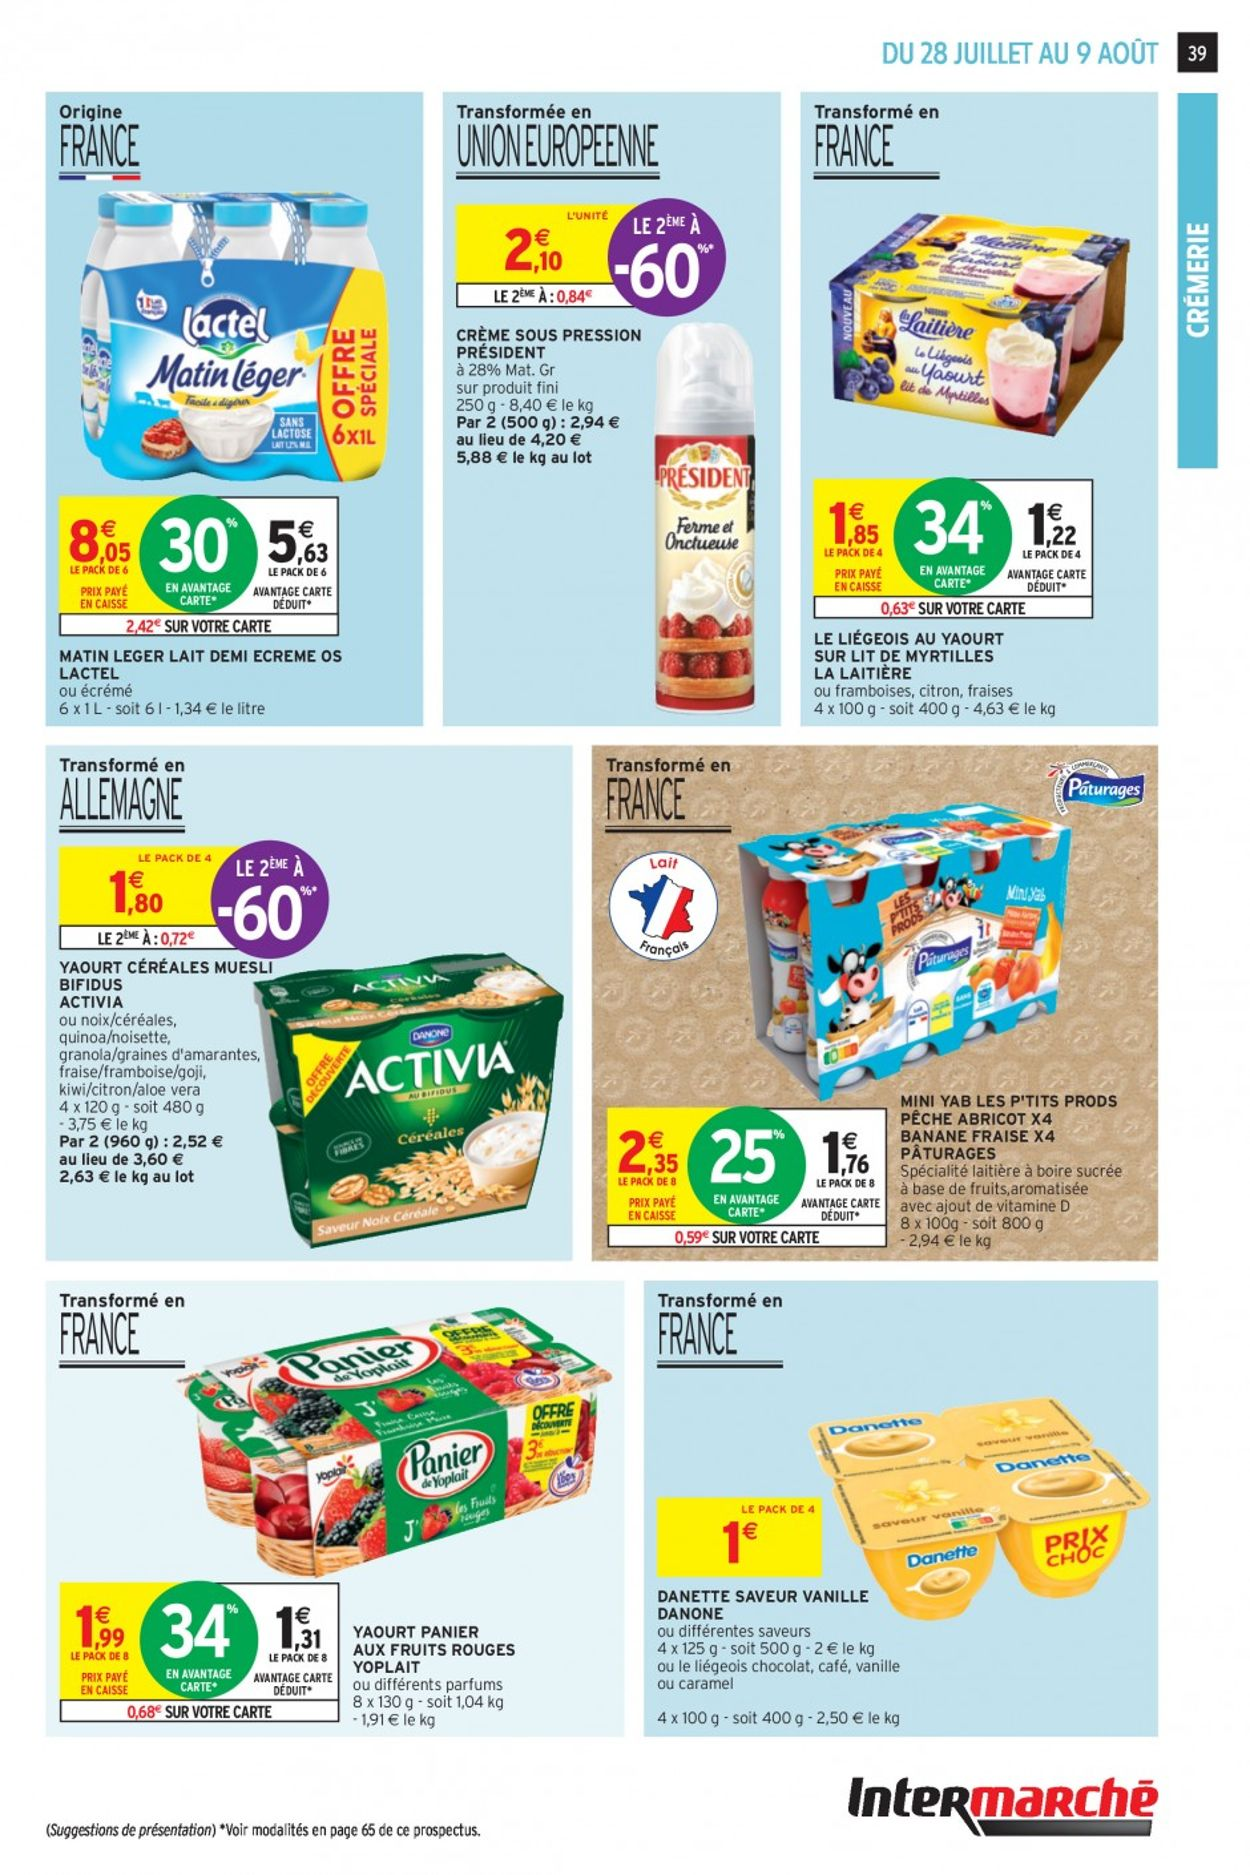 Intermarché Catalogue - 28.07-09.08.2020 (Page 39)